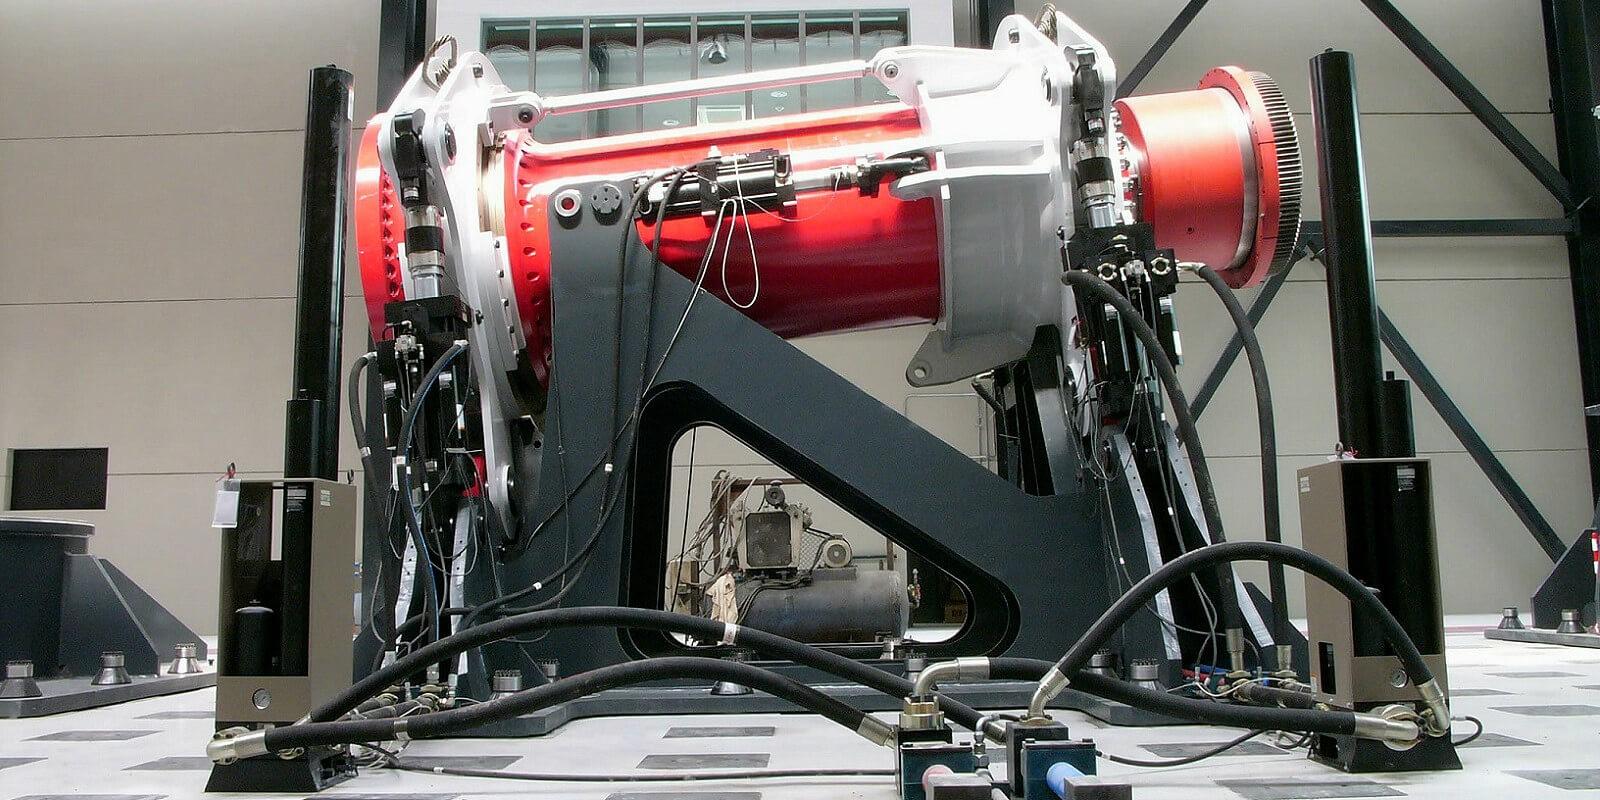 CENER_Windturbine_drivetrain_test_facility_Spain_IDOM_ADA_07